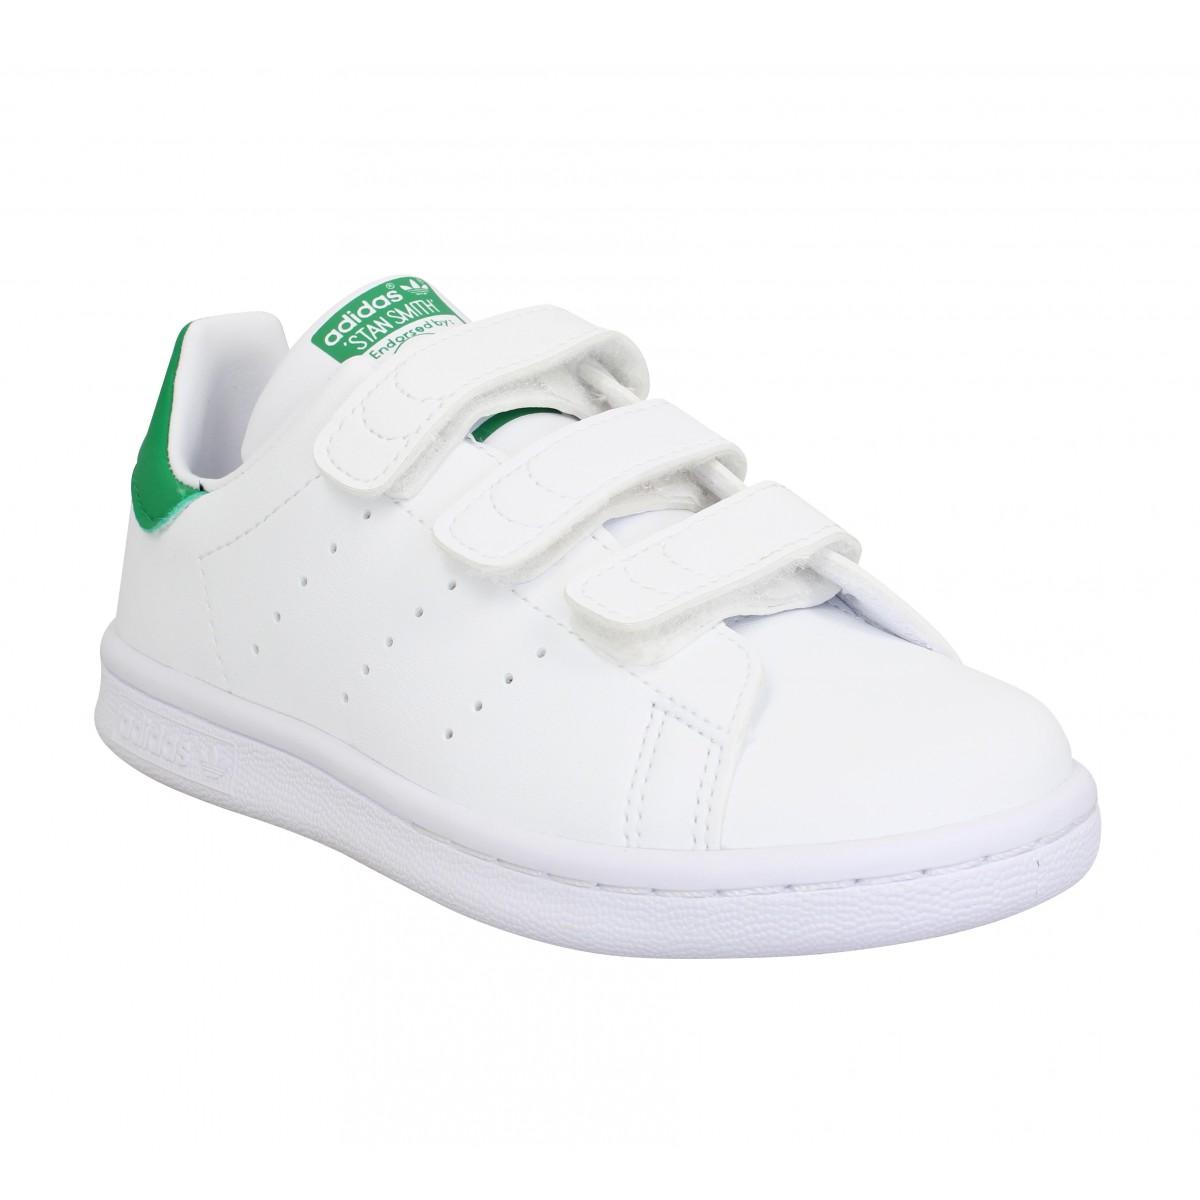 Baskets ADIDAS Stan Smith VL primegreen Enfant Blanc Vert